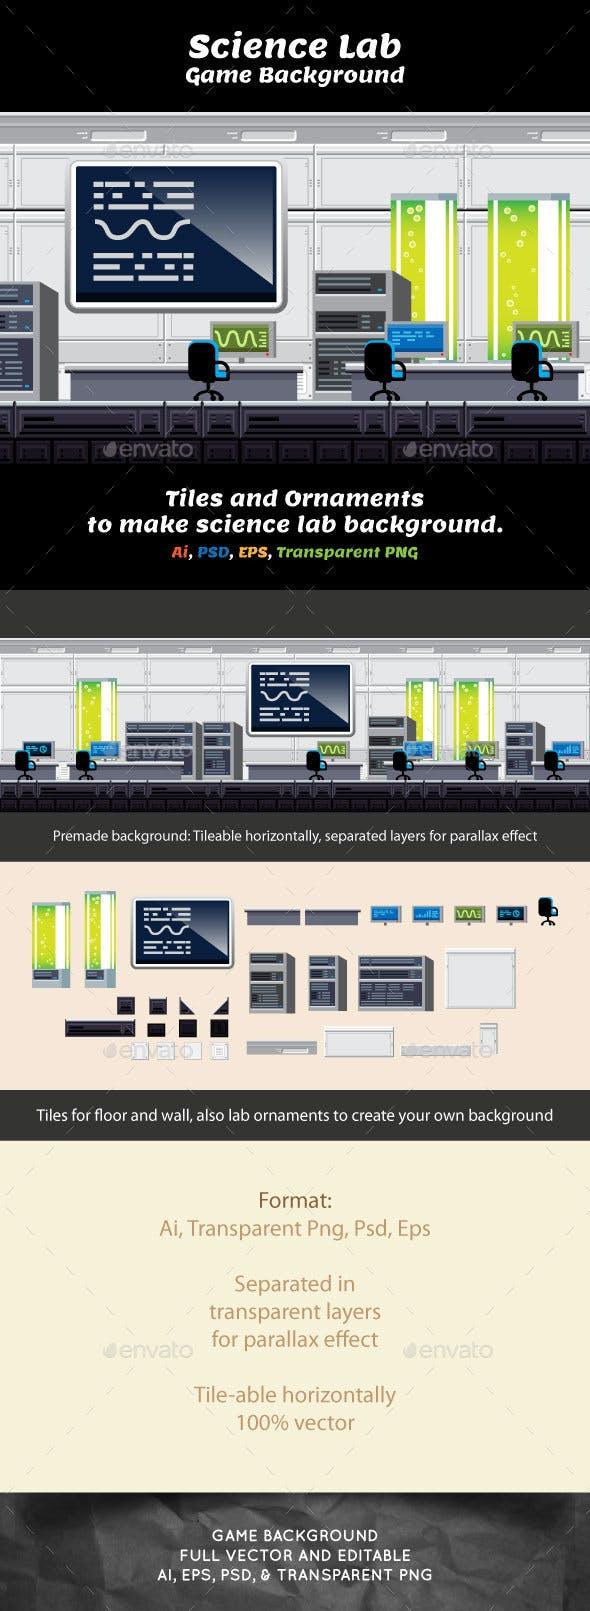 Indoor Game Backround - Science Laboratory